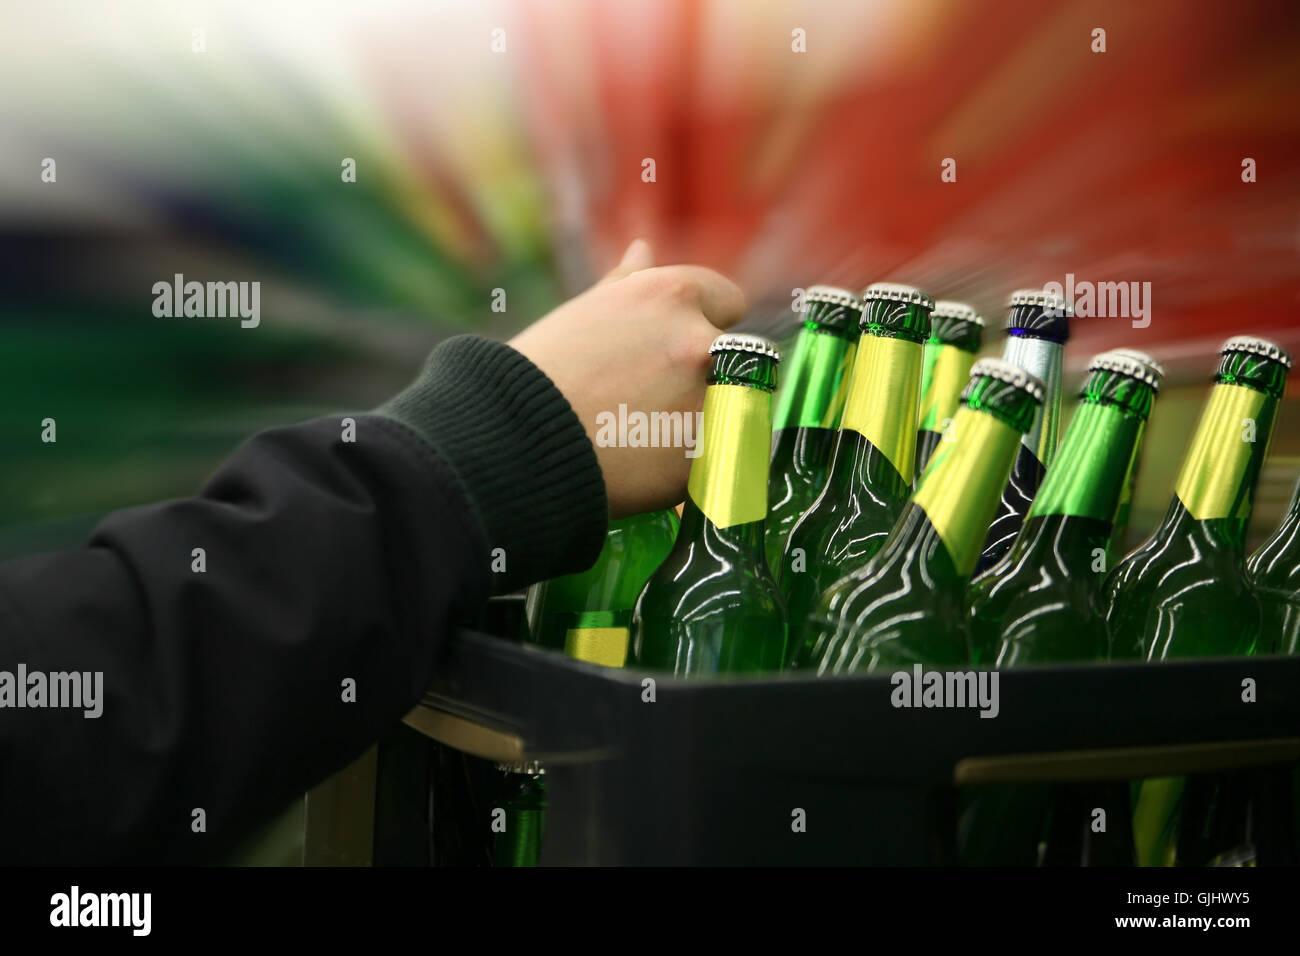 alcohol consumption - Stock Image